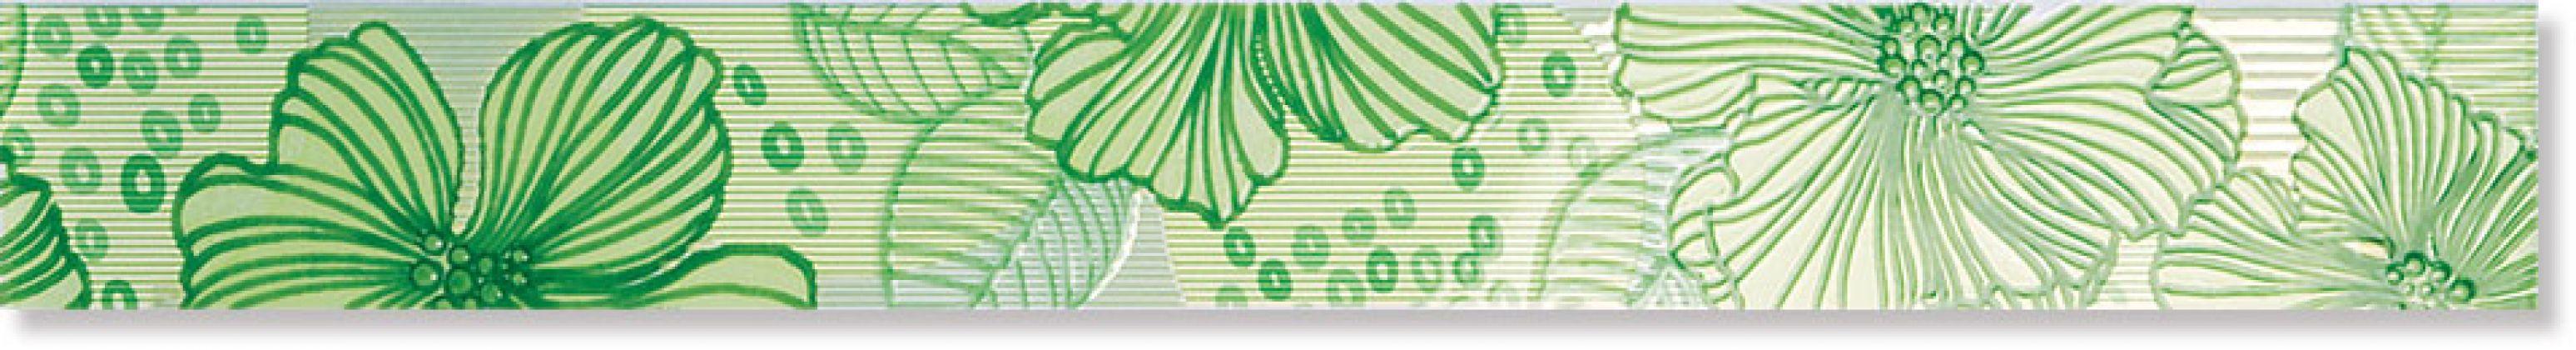 Бордюр A1474/7000 Челси зеленый 6x50